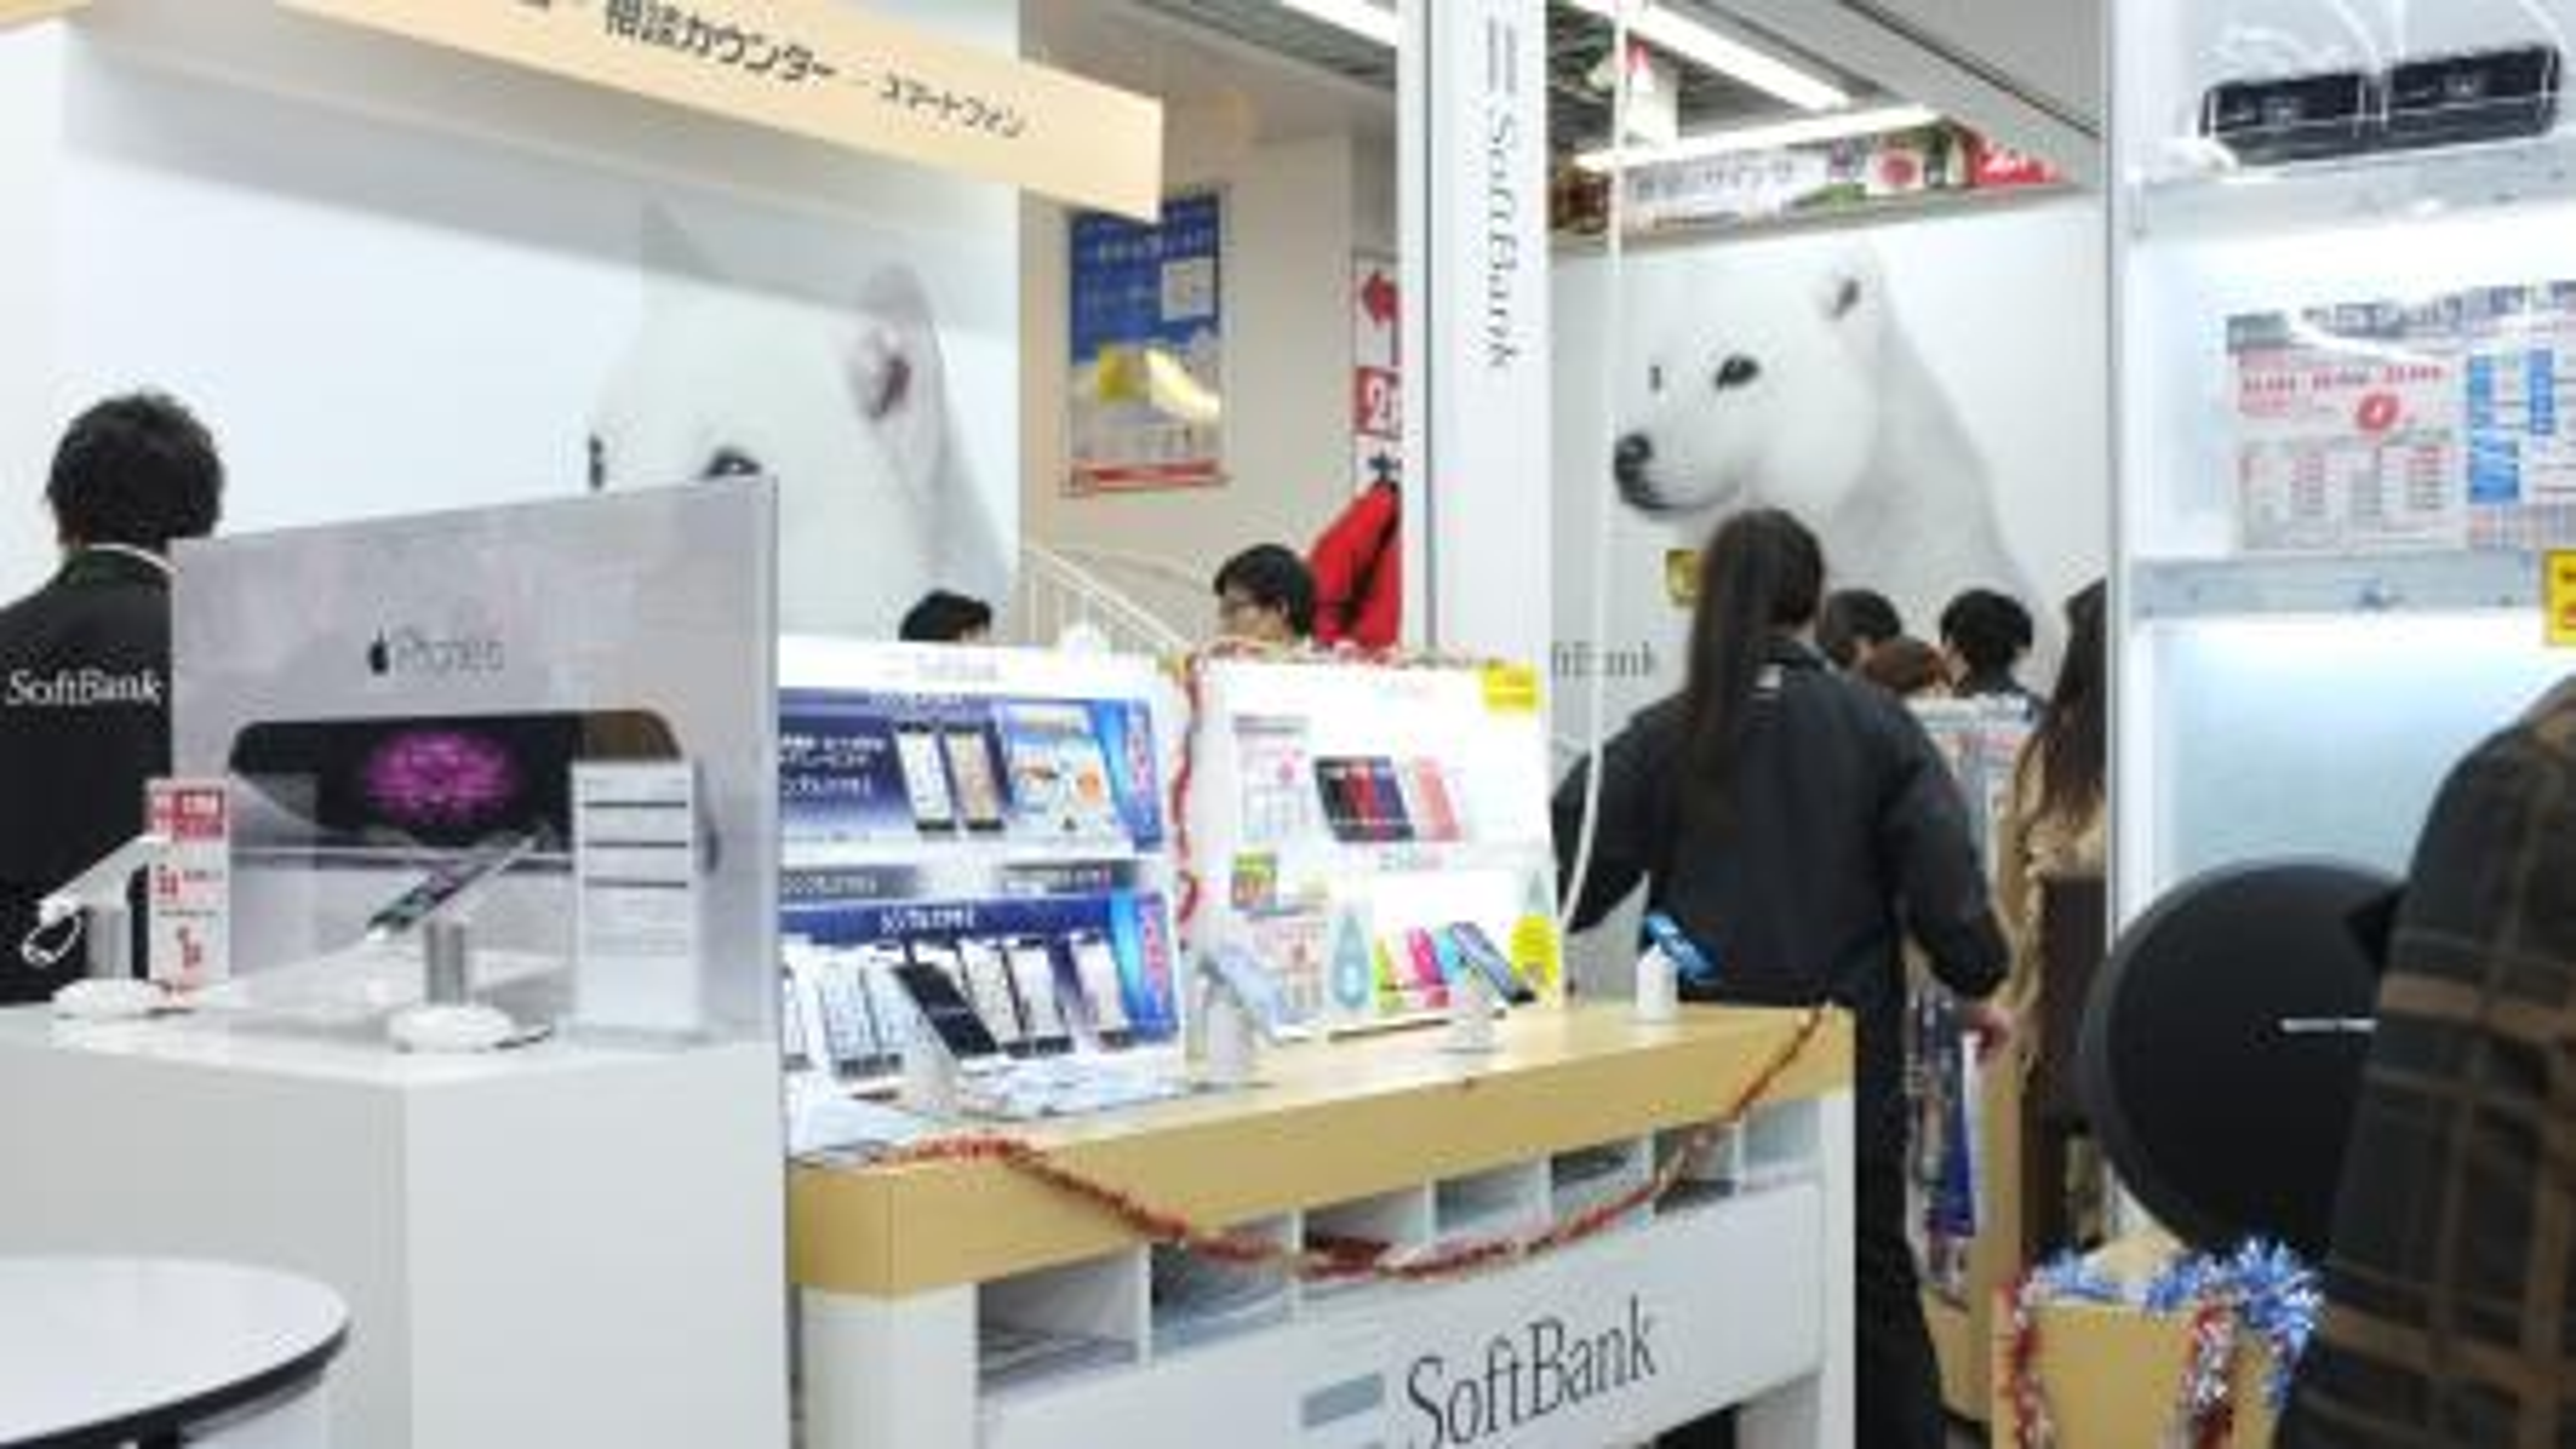 Bic Camera SoftBank counter